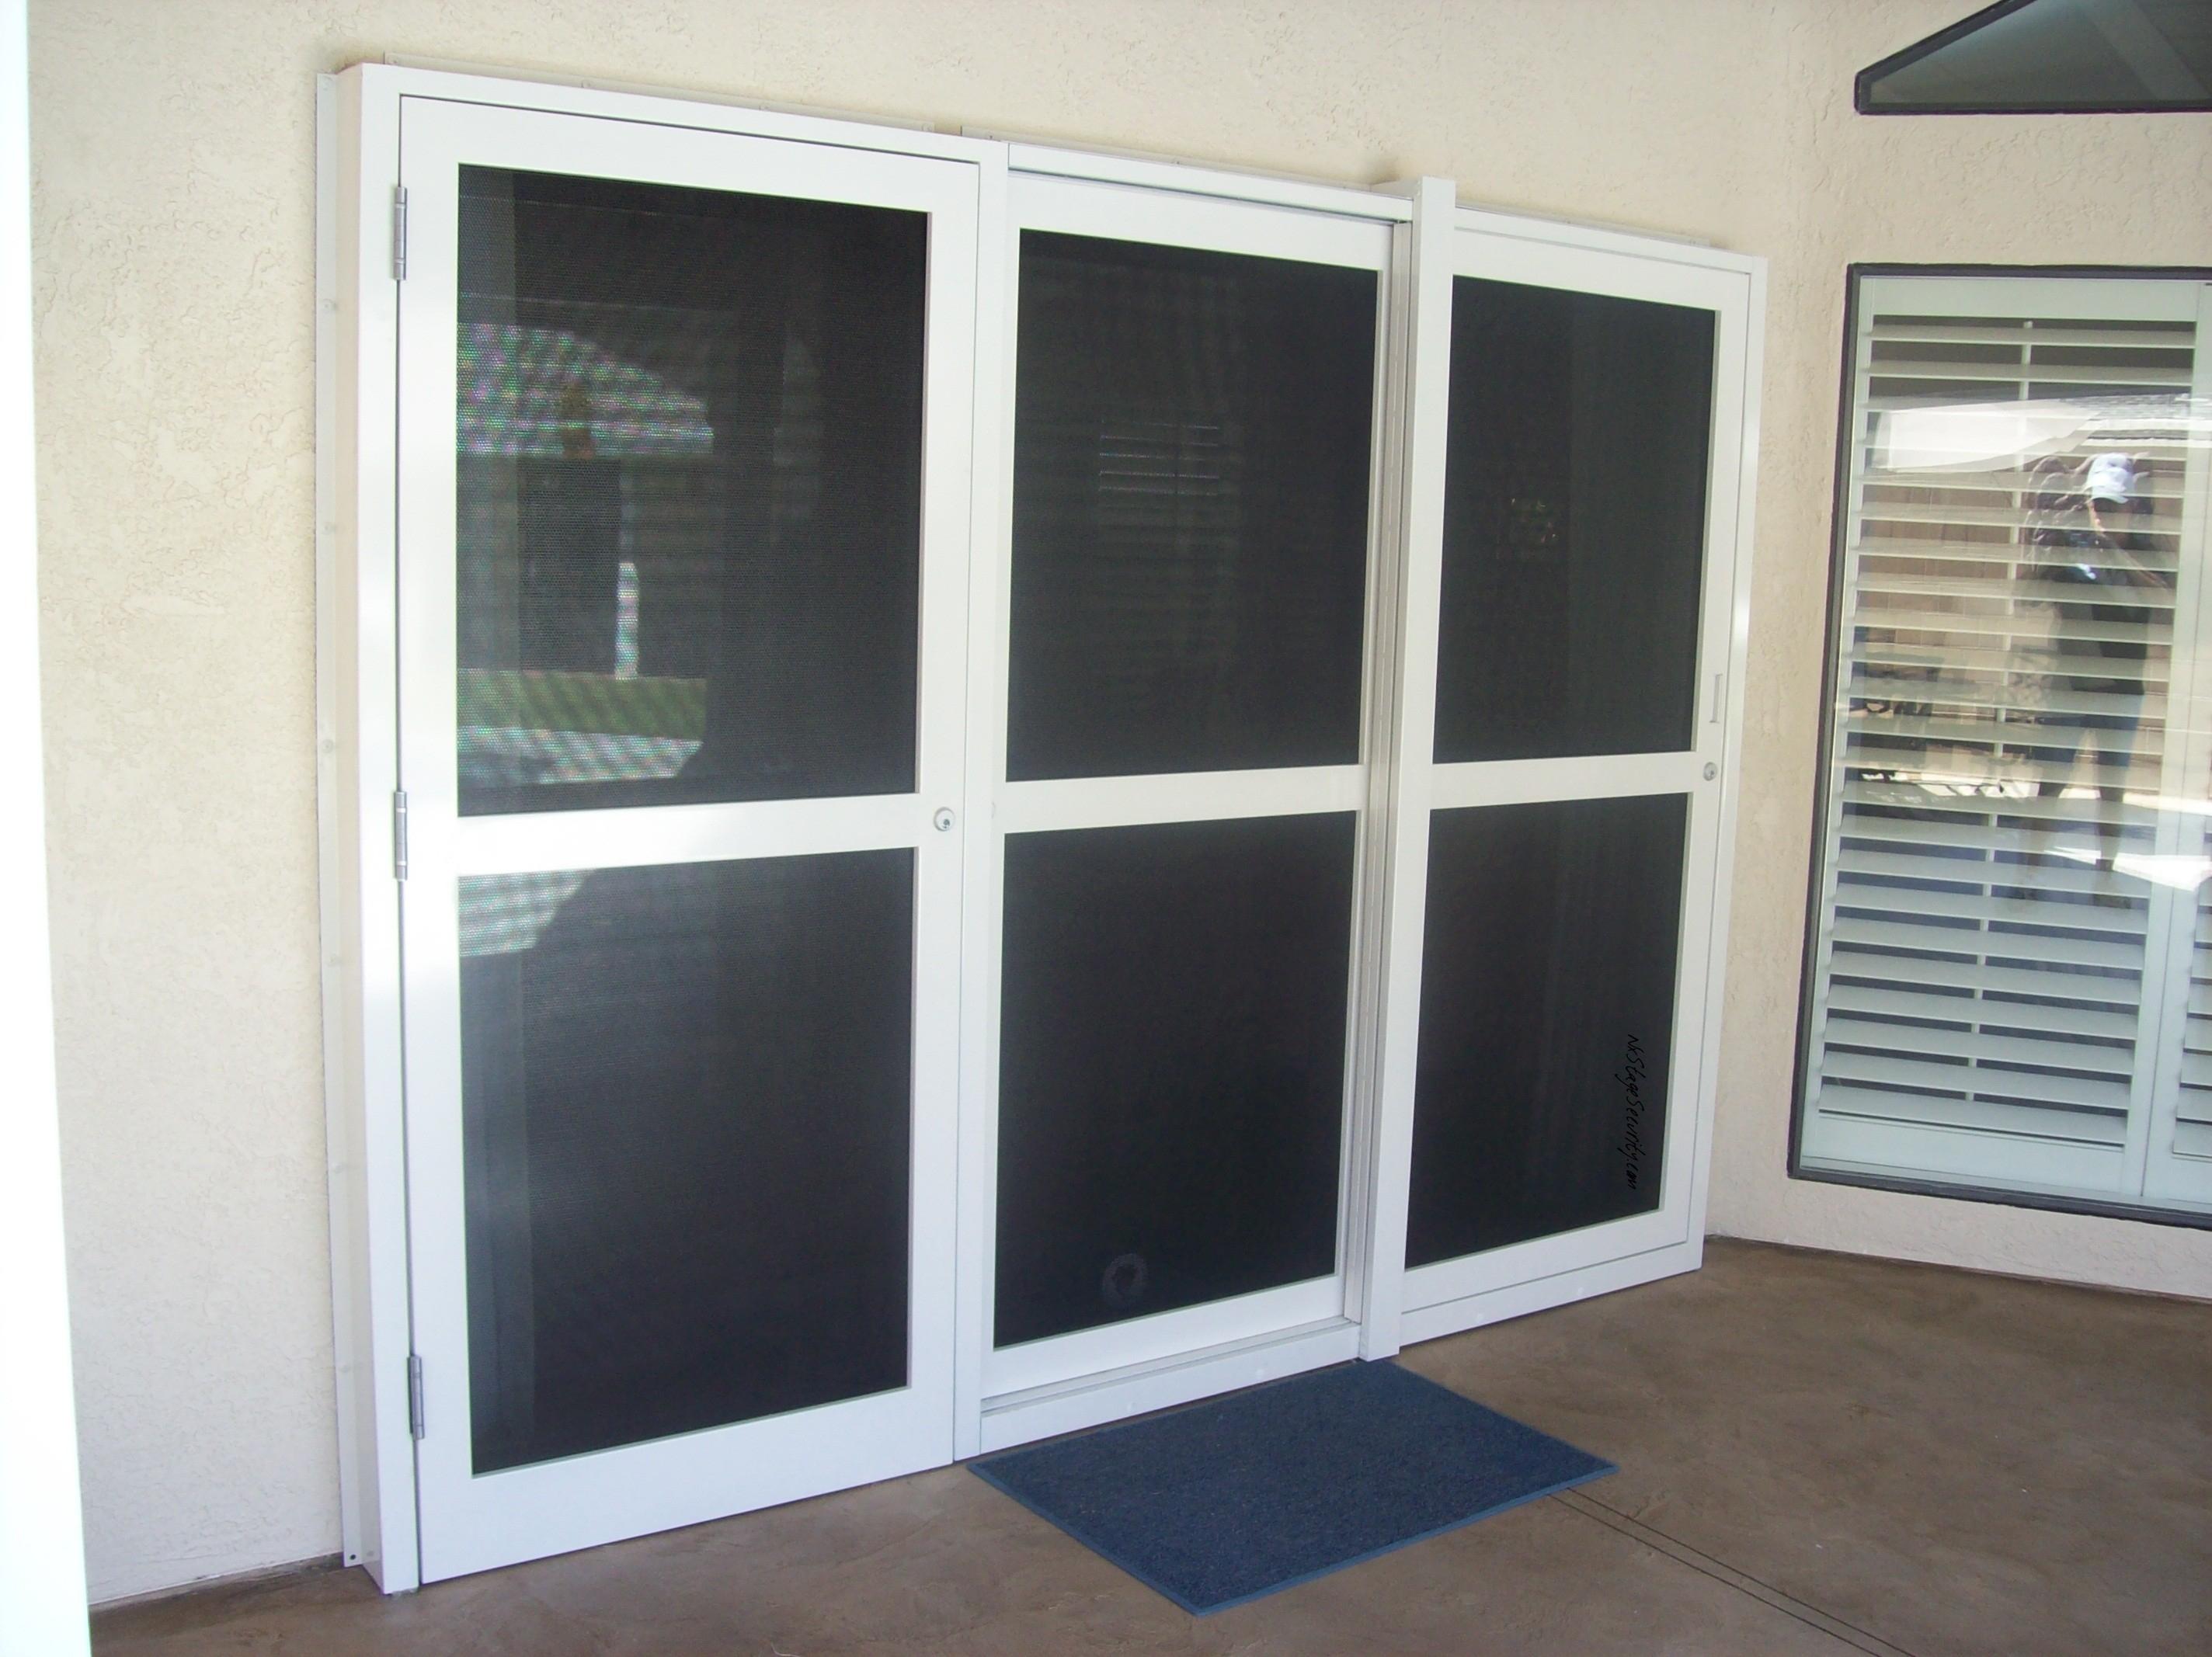 Secure Sliding Glass DoorSecure Sliding Glass Door